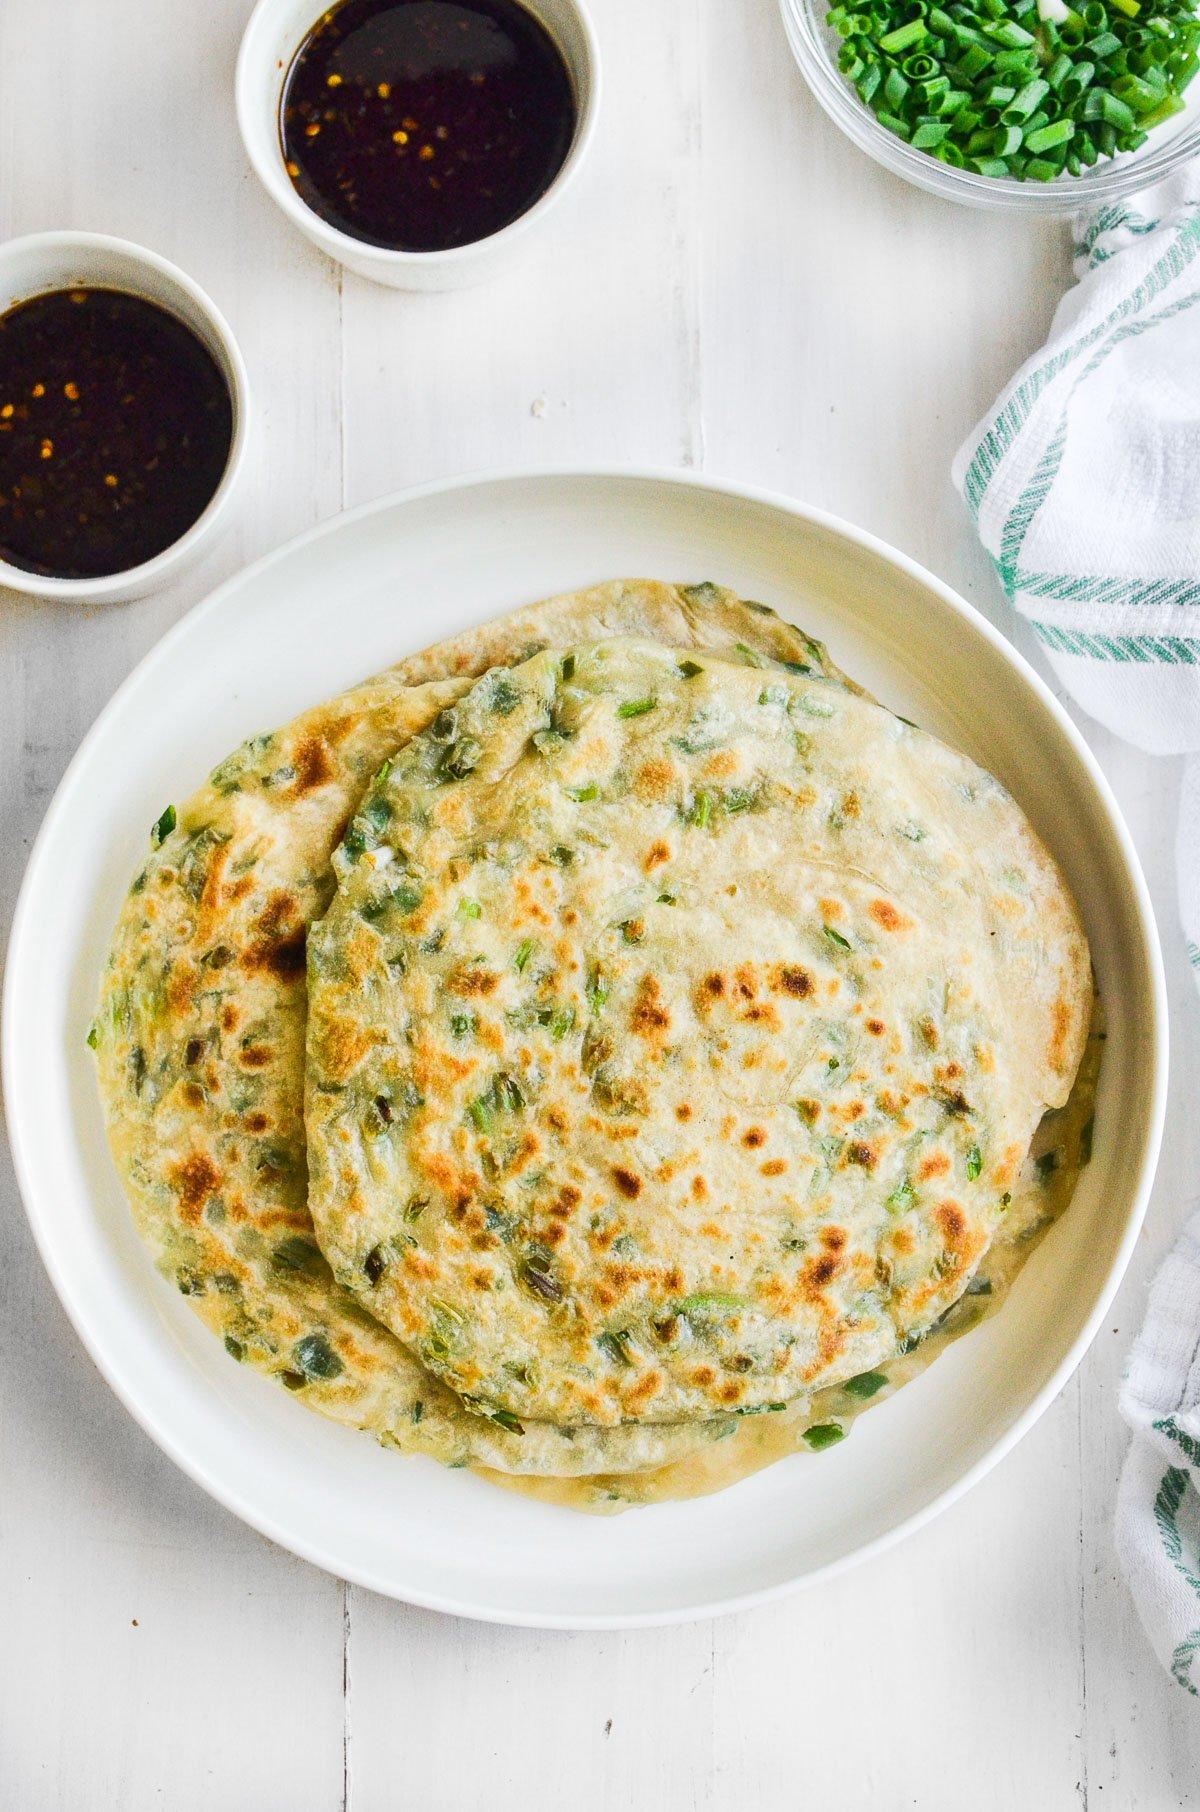 scallion pancakes on a plate